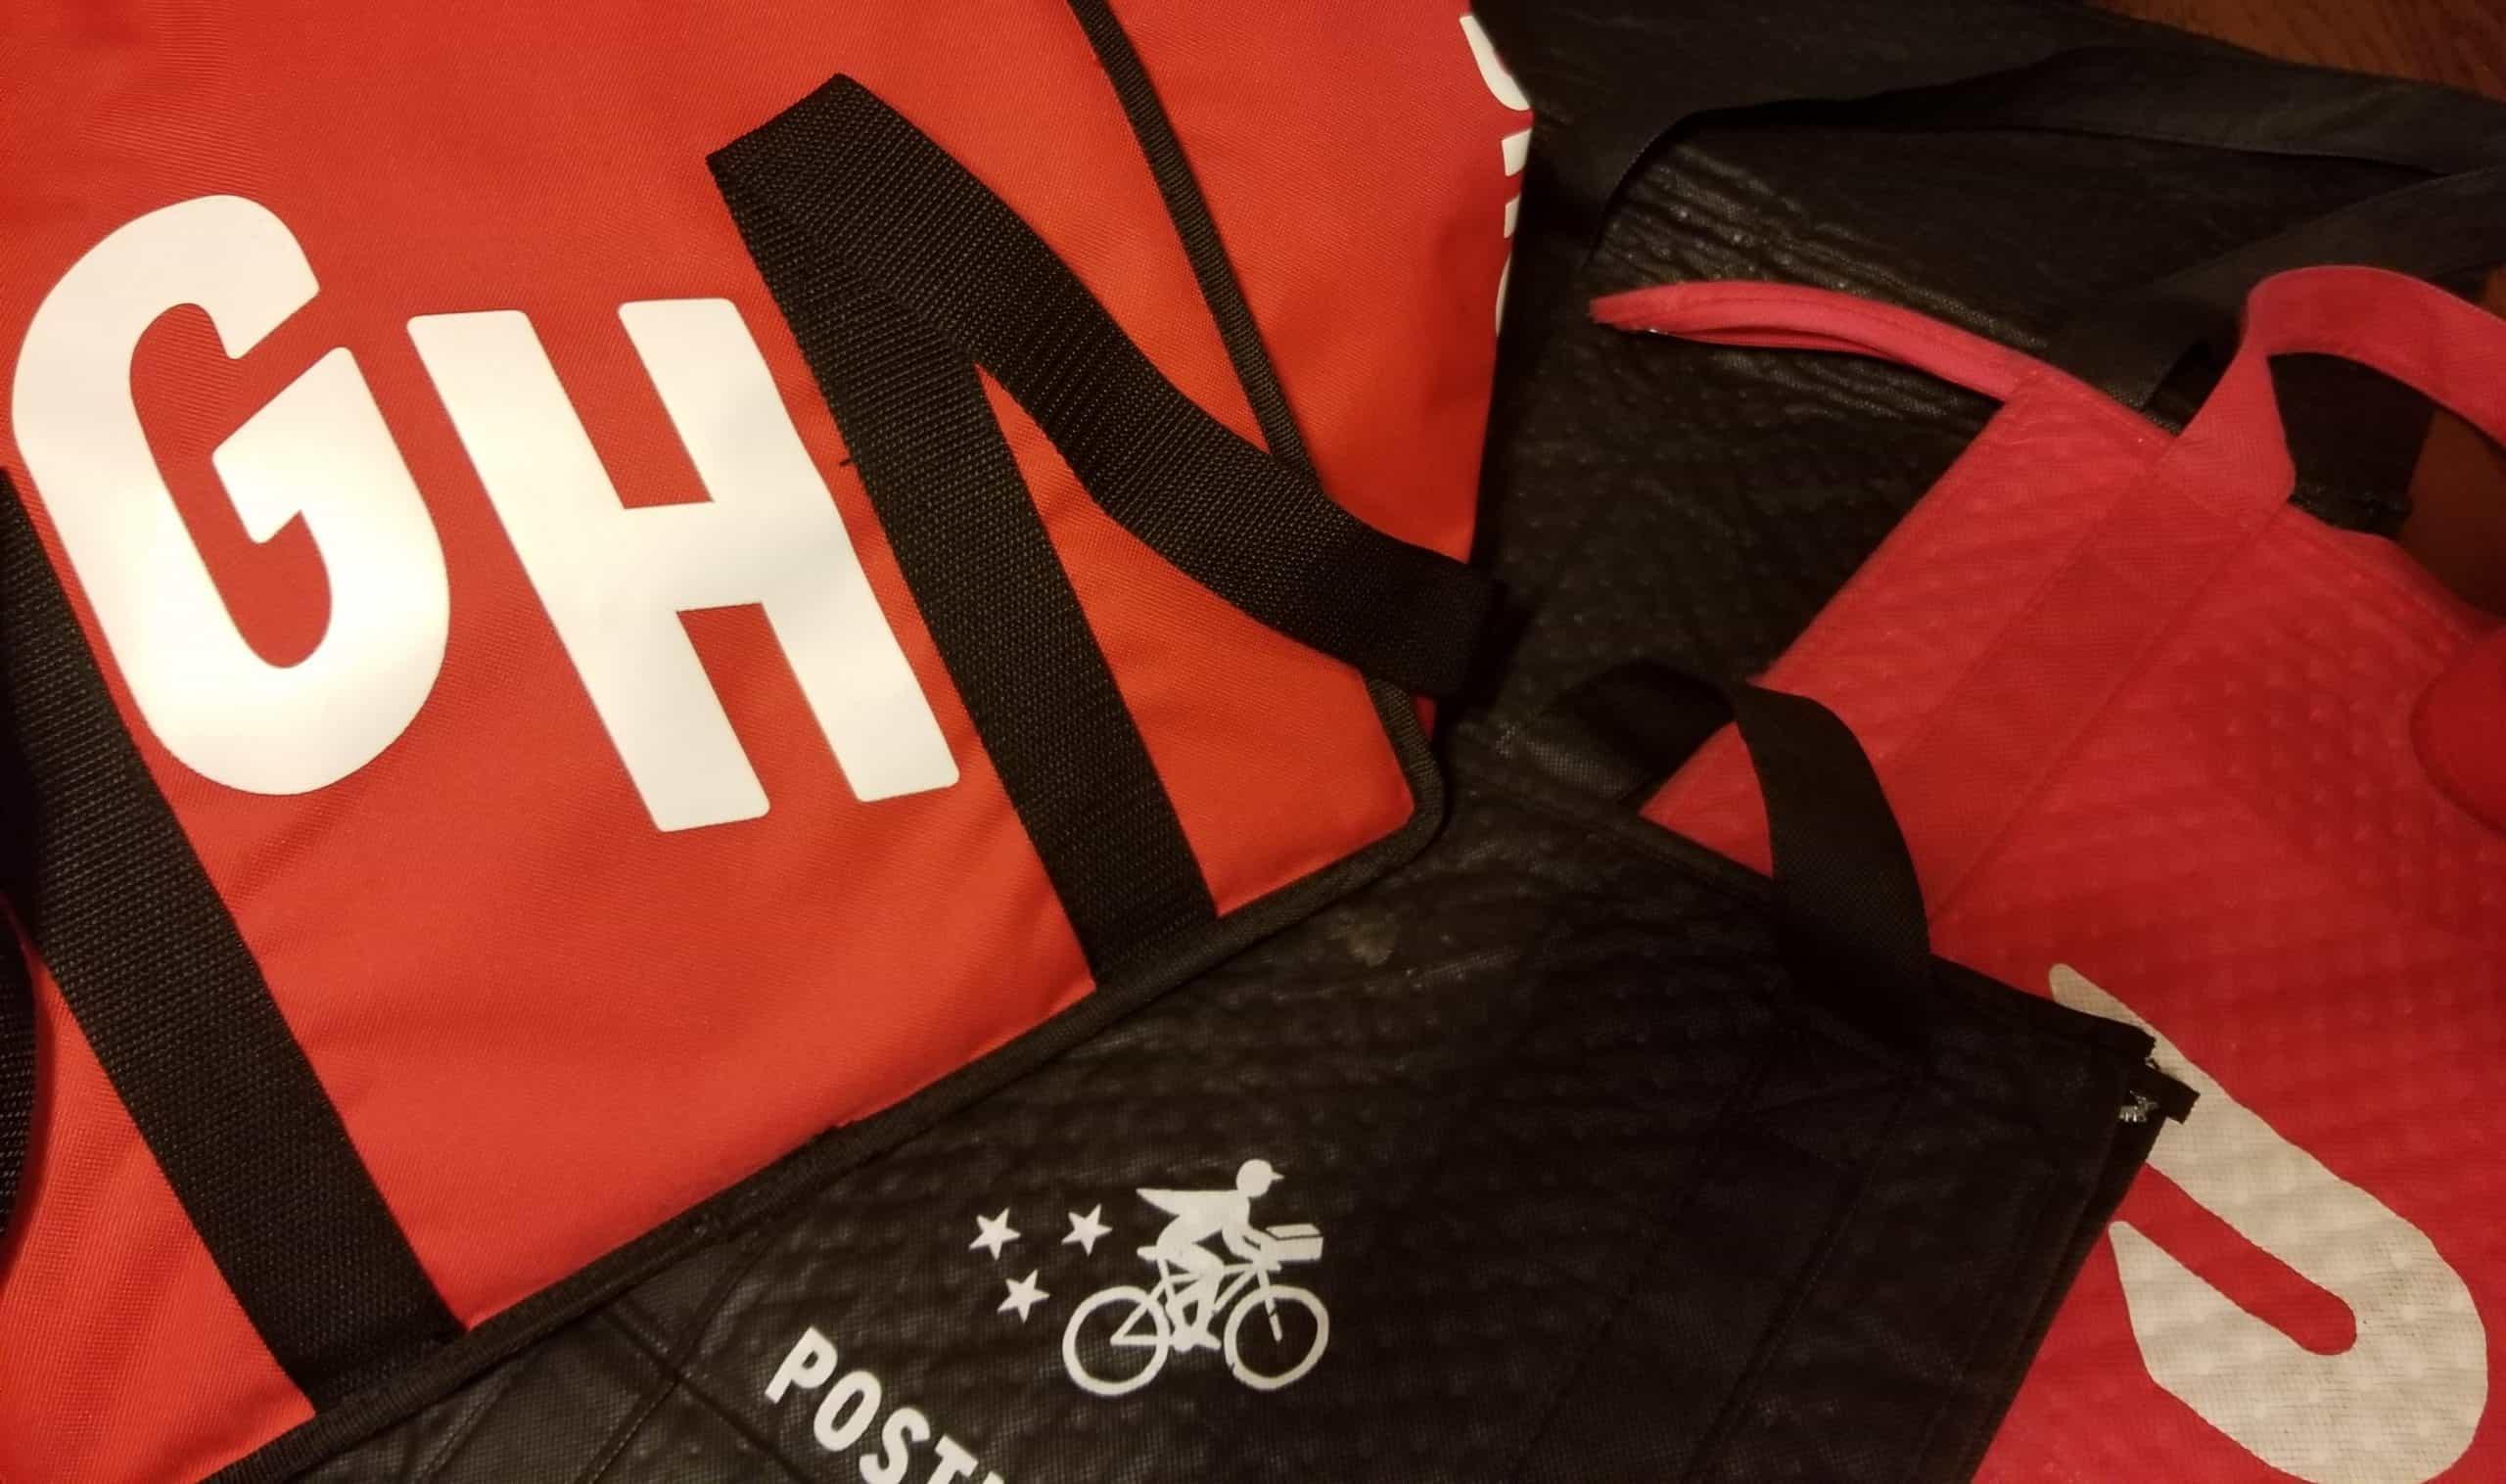 Grubhub, Postmates, UberEats and Doordash Insulated Delivery Bags